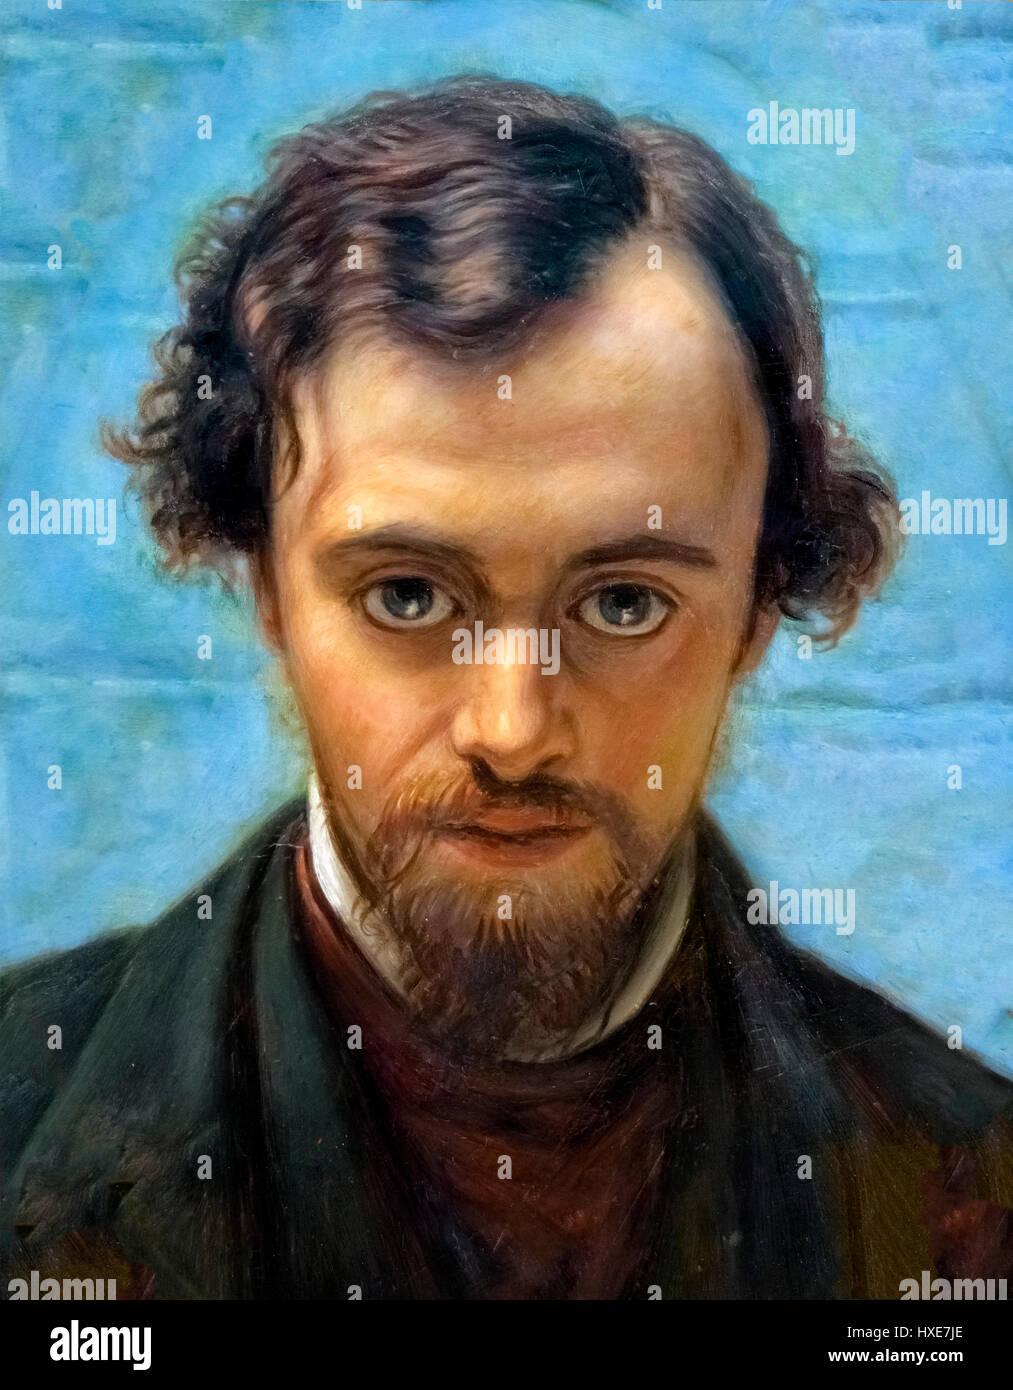 Gabriel Dante Rossetti (1828-1882), portrait by William Holman Hunt, oil on panel, c.1882. Rossetti, along with - Stock Image